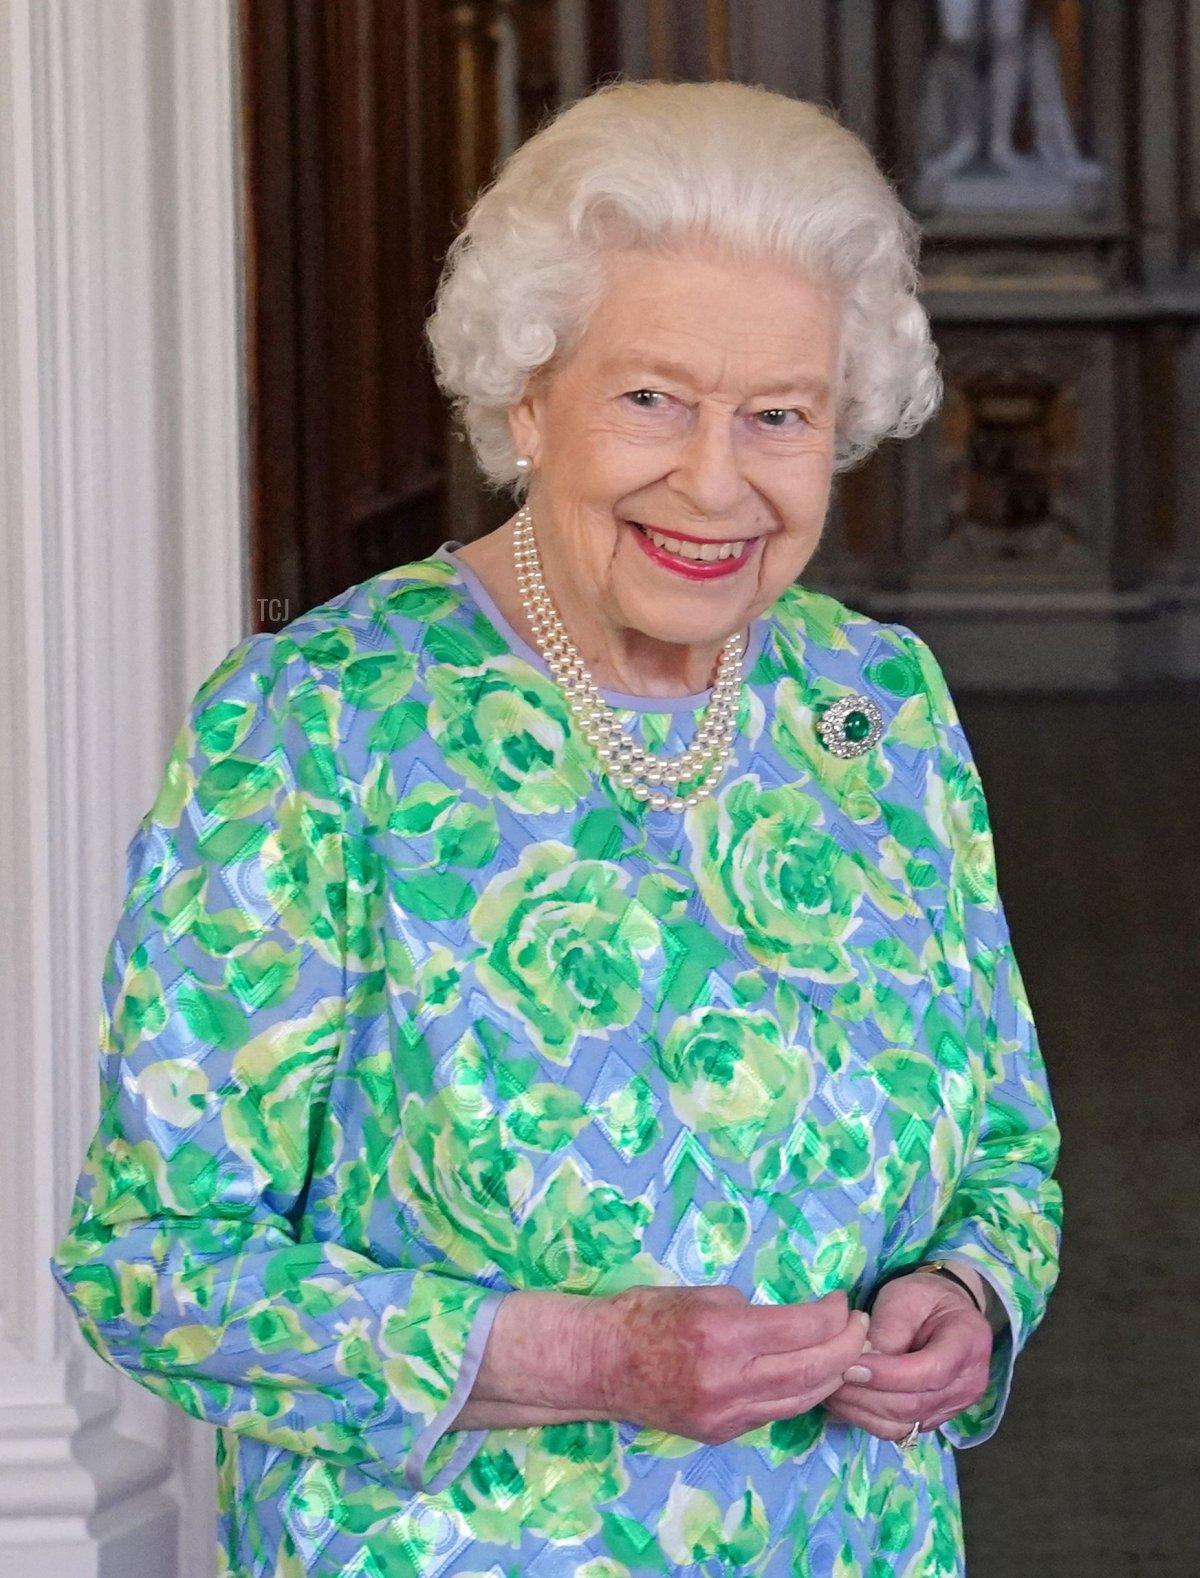 Britain's Queen Elizabeth II receives German Chancellor Angela Merkel during an audience at Windsor Castle in Windsor, Berkshire on July 2, 2021